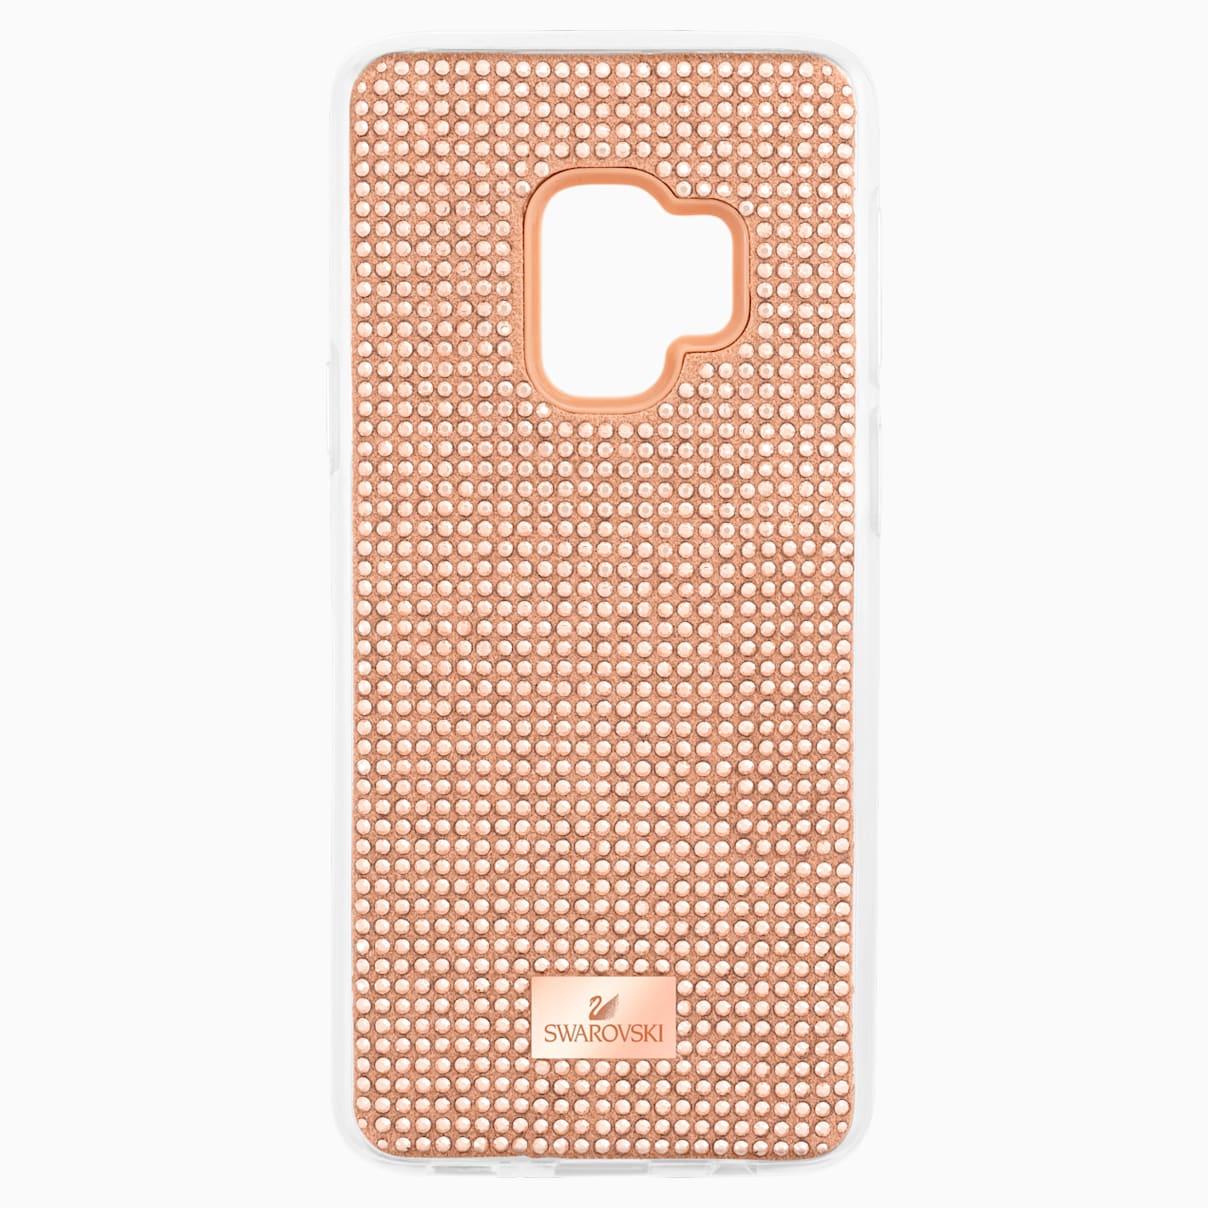 Swarovski Hero Smartphone Case with Bumper, Galaxy S®9, Pink